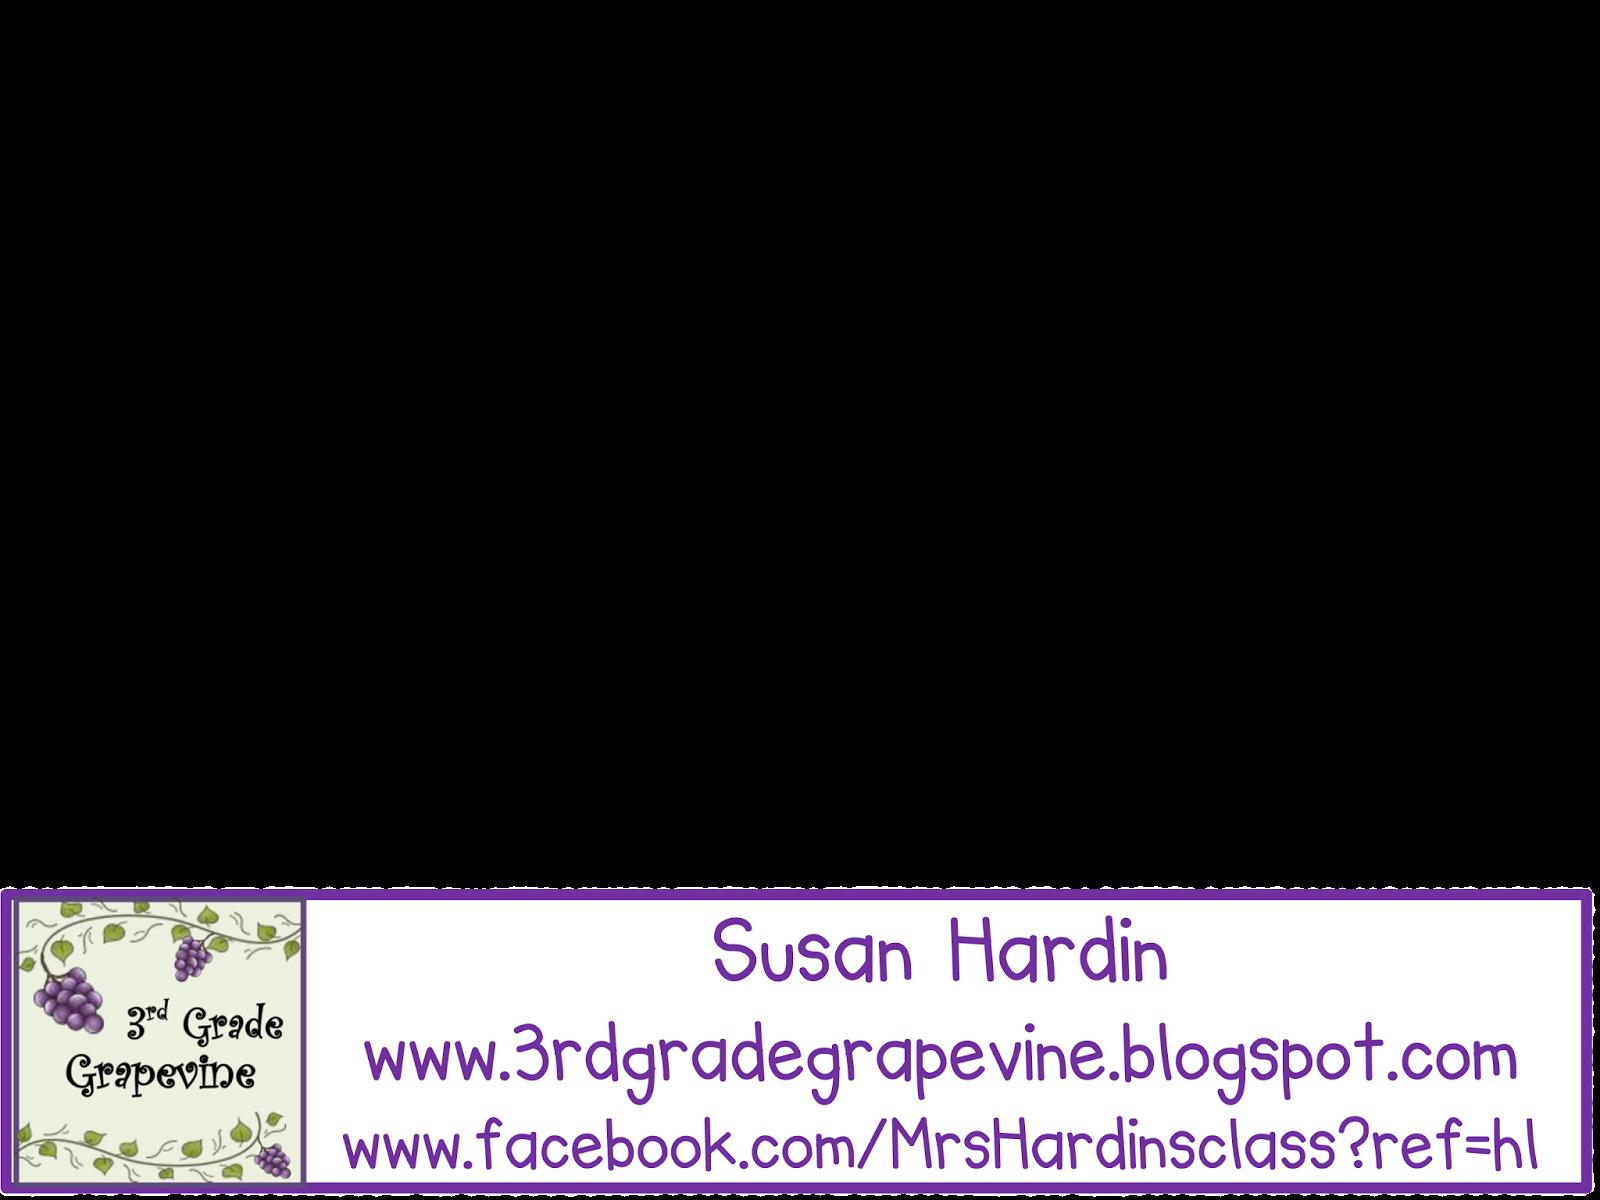 http://3rdgradegrapevine.blogspot.com/